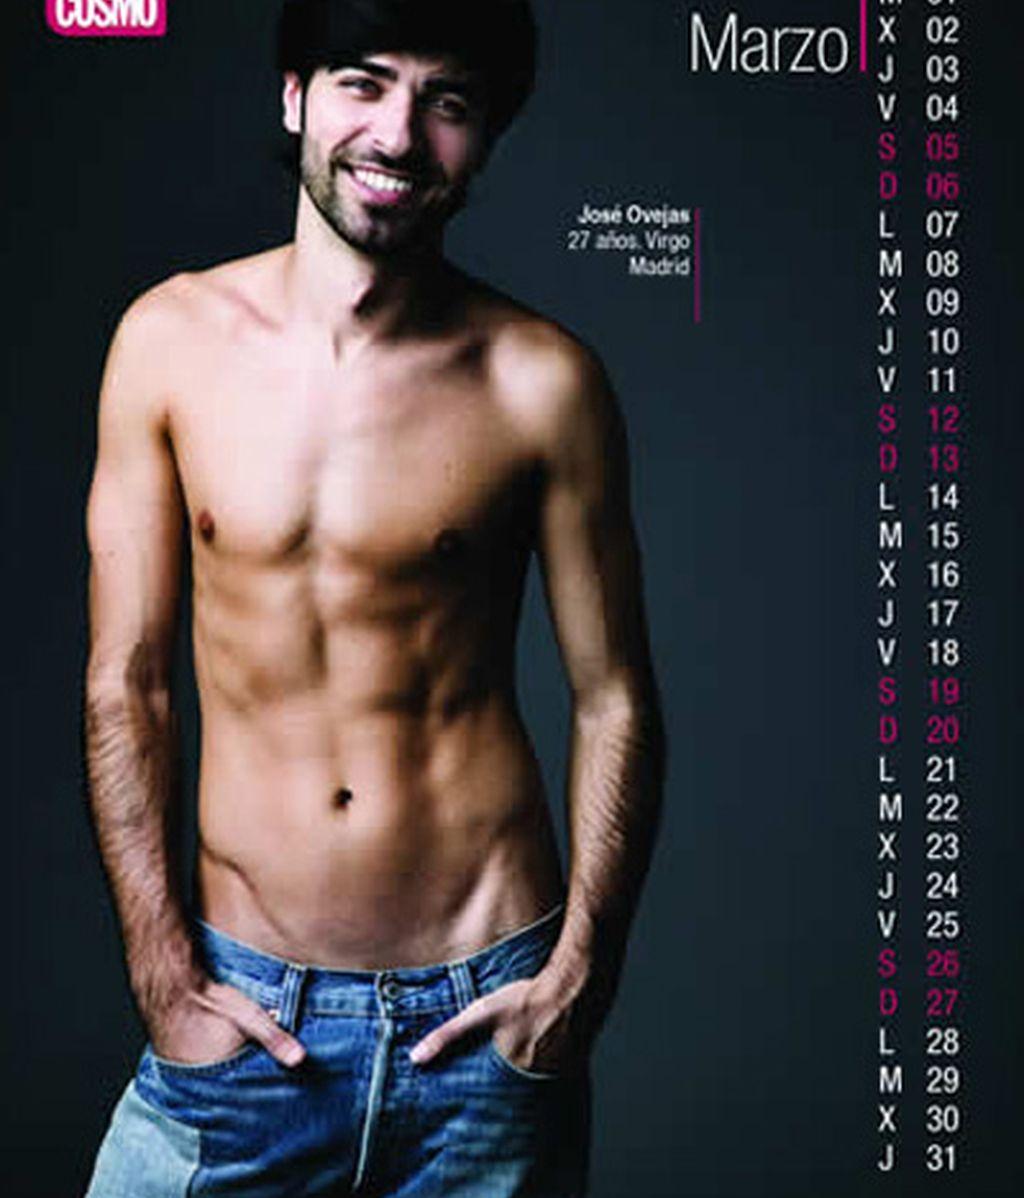 Calendario 'Chico Cosmo 2011'